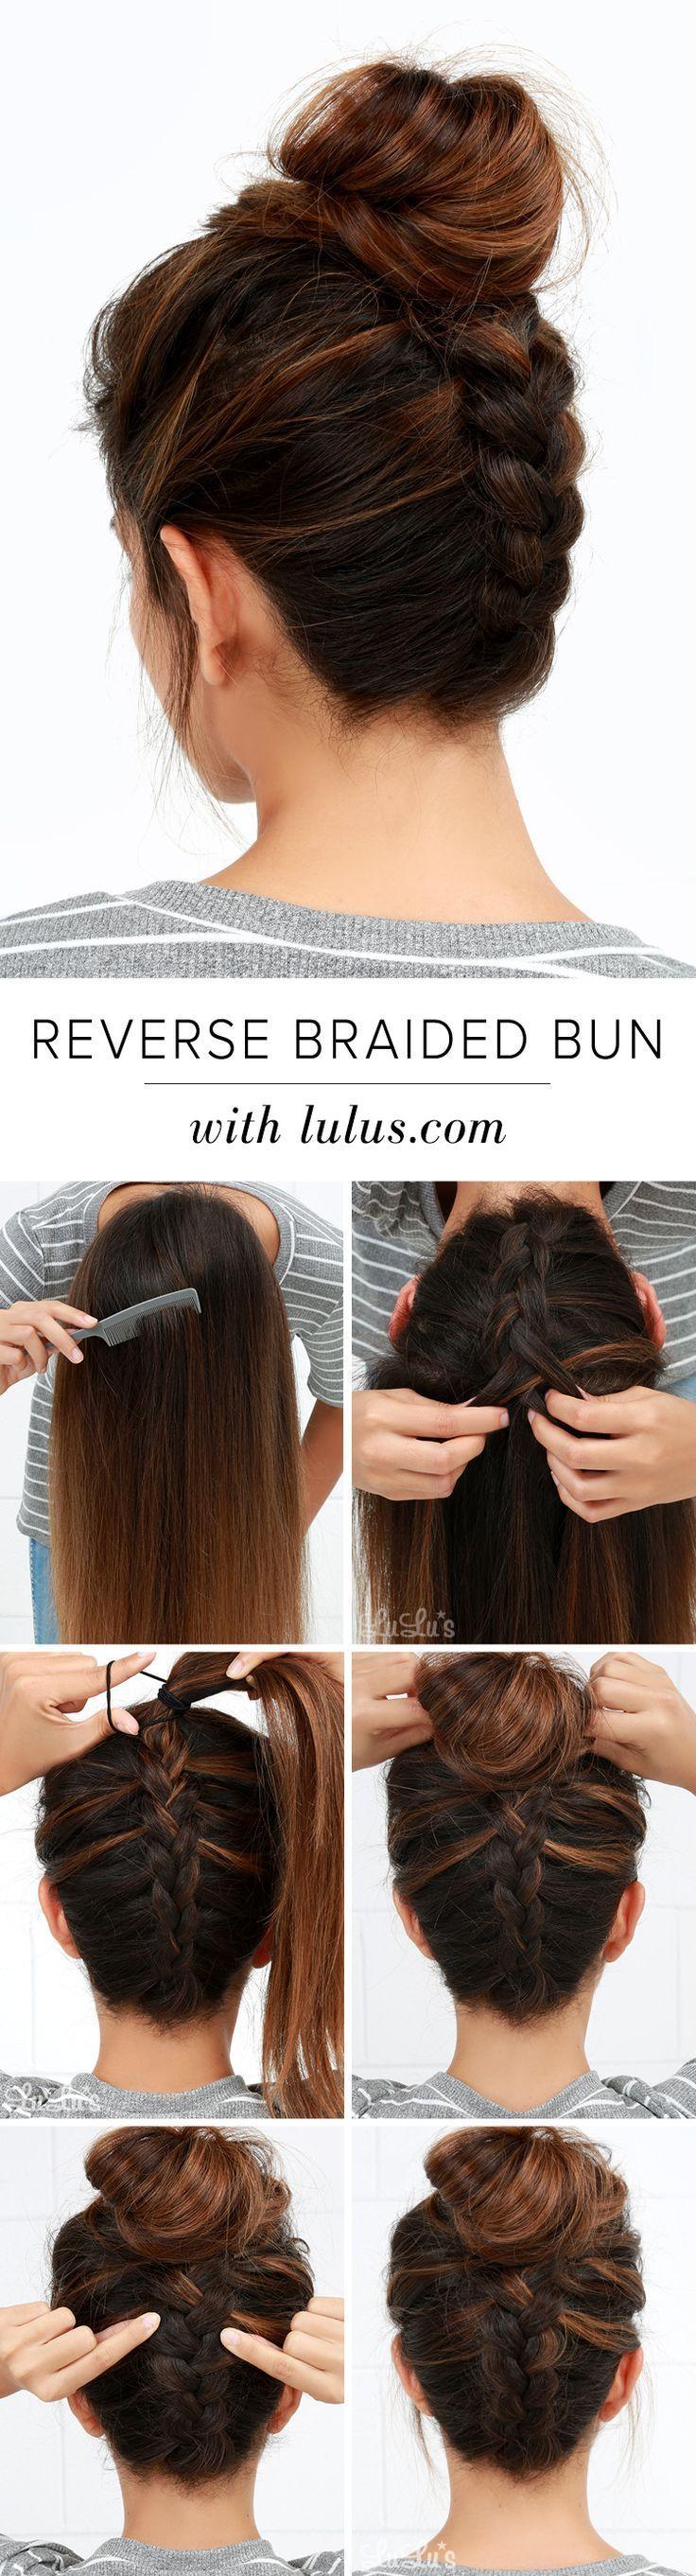 best 25+ braided buns ideas on pinterest | buns, fishtail bun and